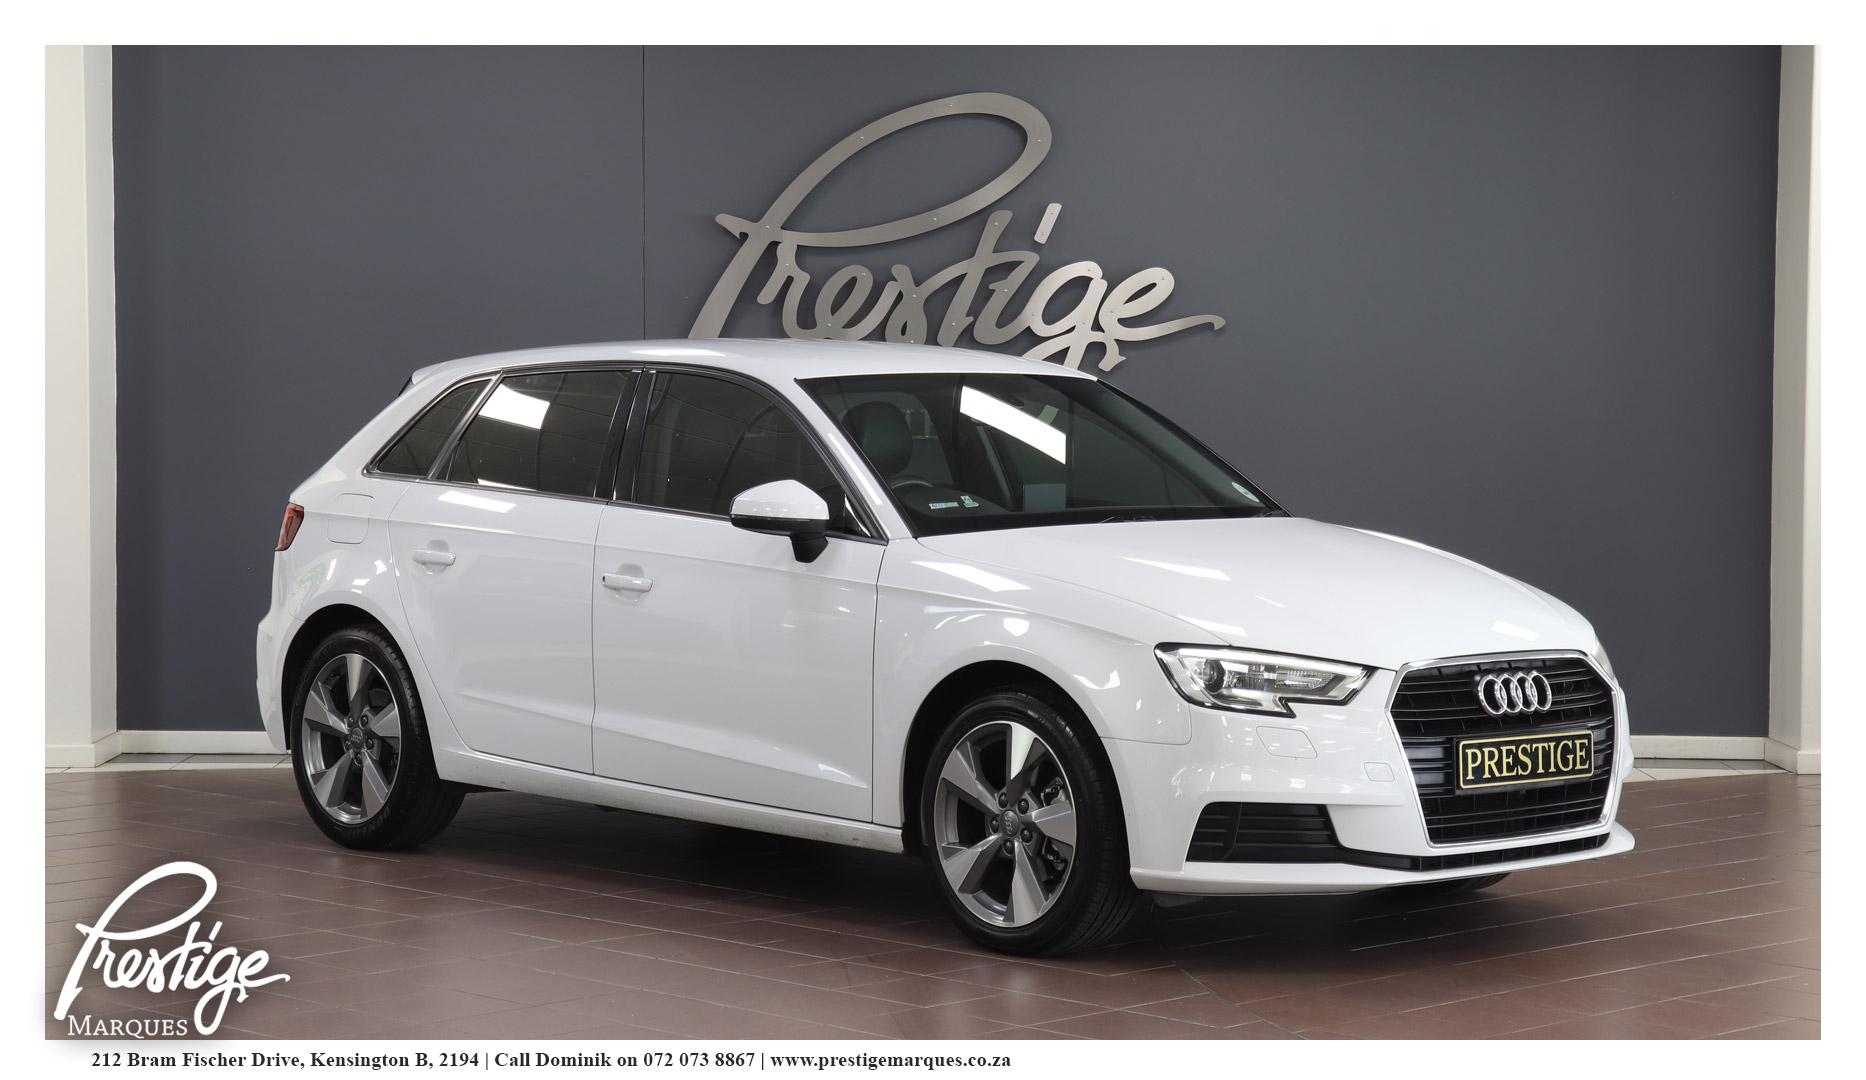 2017-Audi-A3-Sportback-1-4-TFSi-Stronic-Prestige-Marques-Randburg-Sandton-1